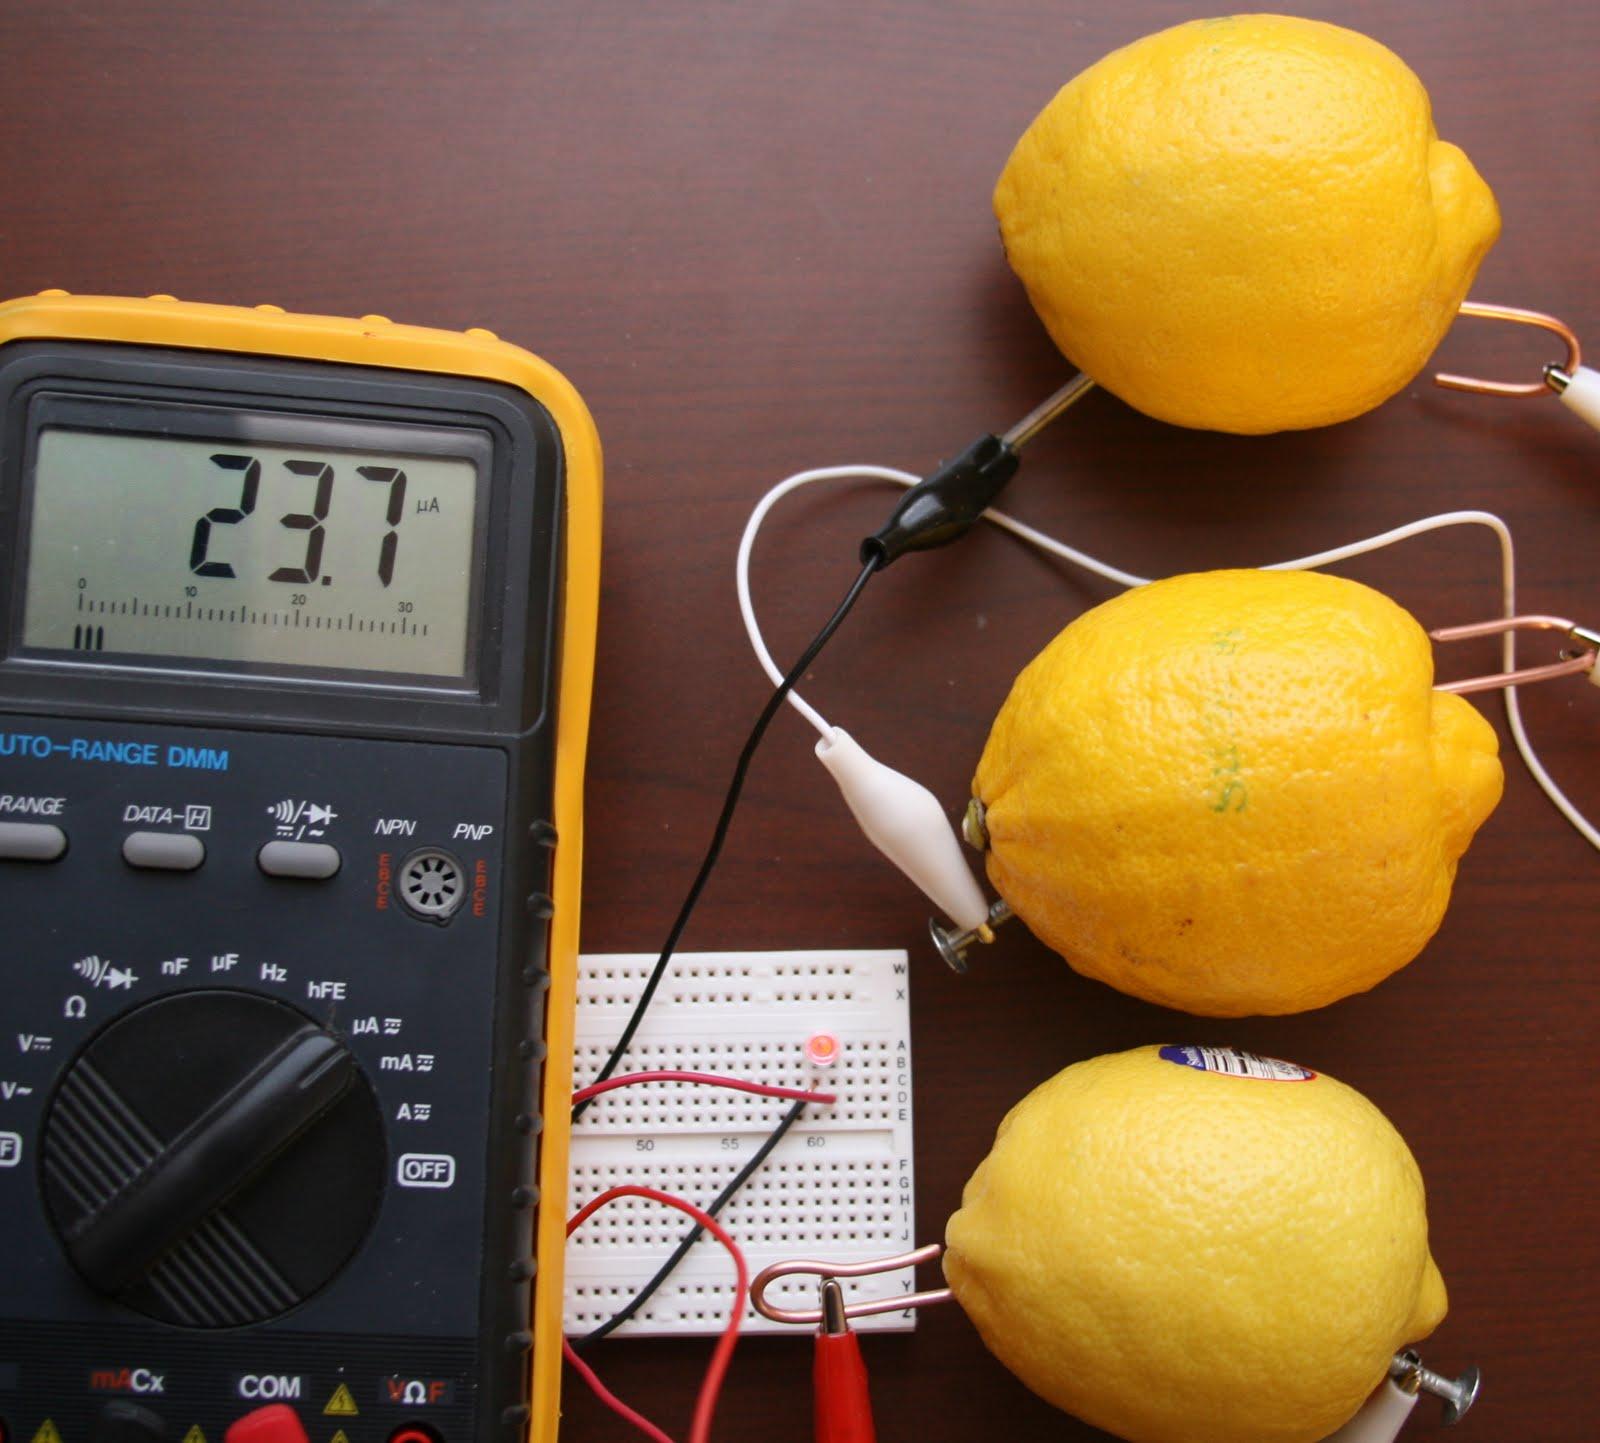 Lemon Circuit Zinc Graphite Worksheet And Wiring Diagram Electriccircuitprojectideas Electric Science Project Joel Avrunin S Effective Bits Of Knowledge Batteries From Lemons Rh Effectivebits Net Pencil